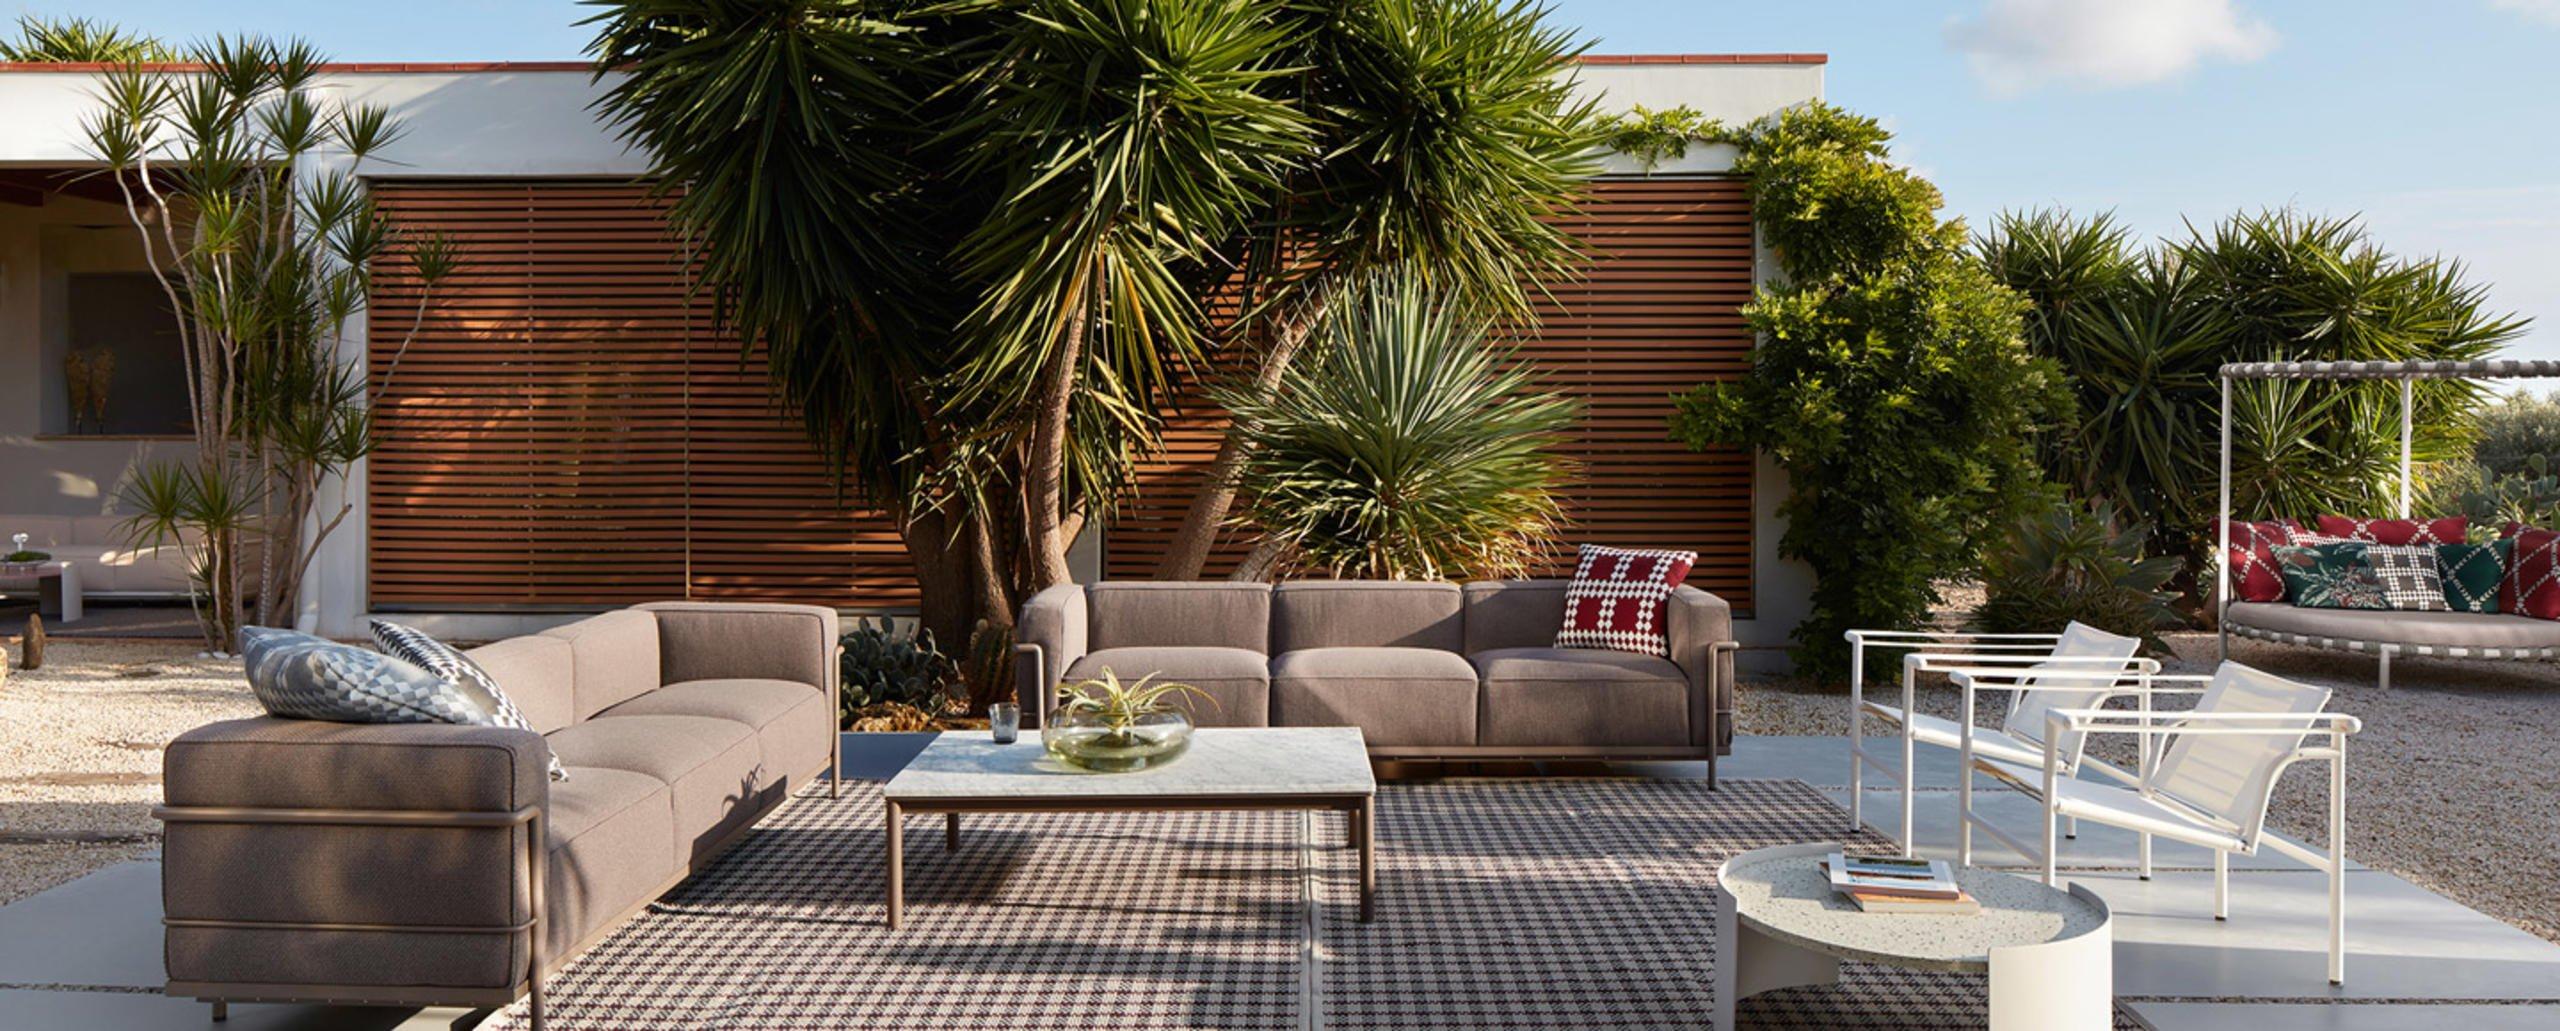 Le Corbusier Outdoor Kollektion von Cassina